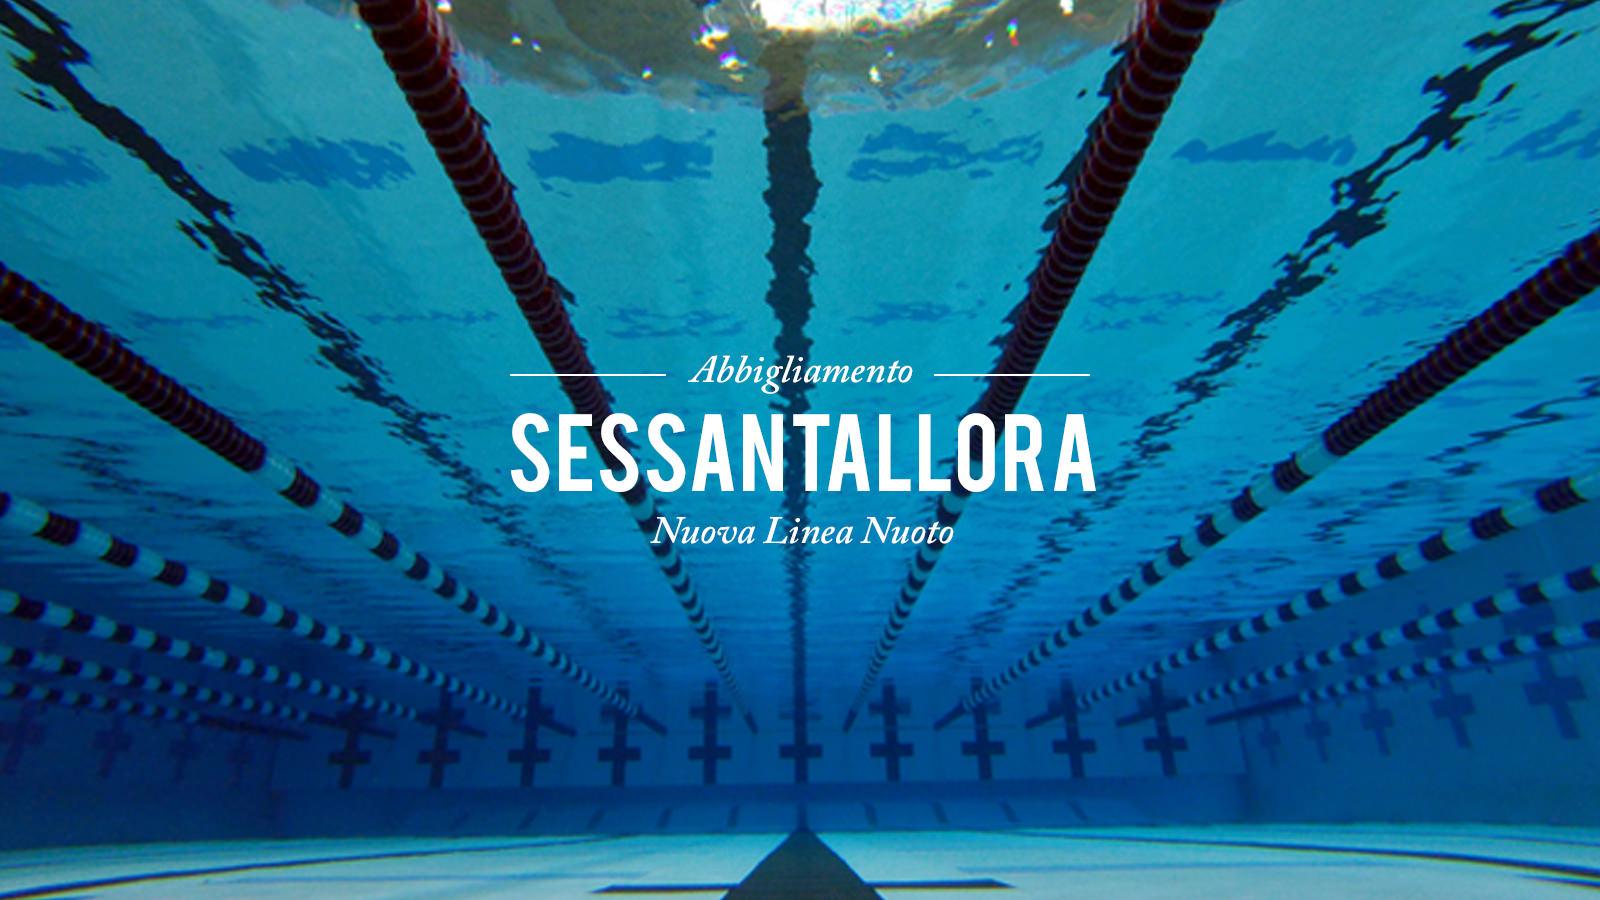 Linea Nuoto Sessantallora